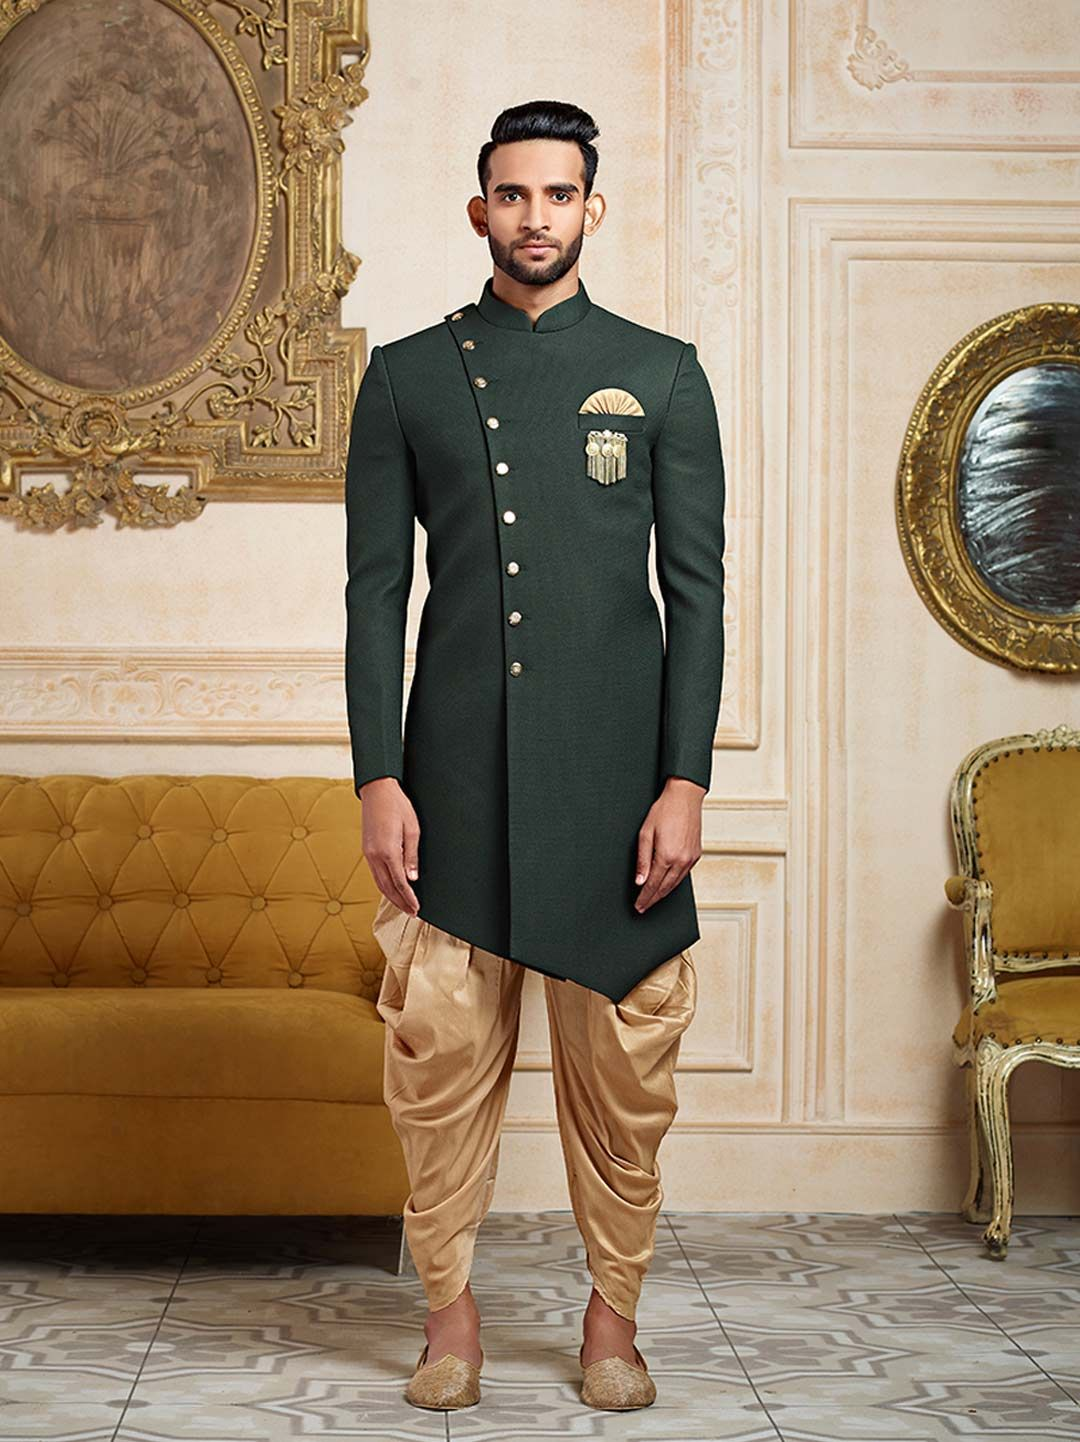 c4e3a46e30 Party Wear Indian Dresses For Man